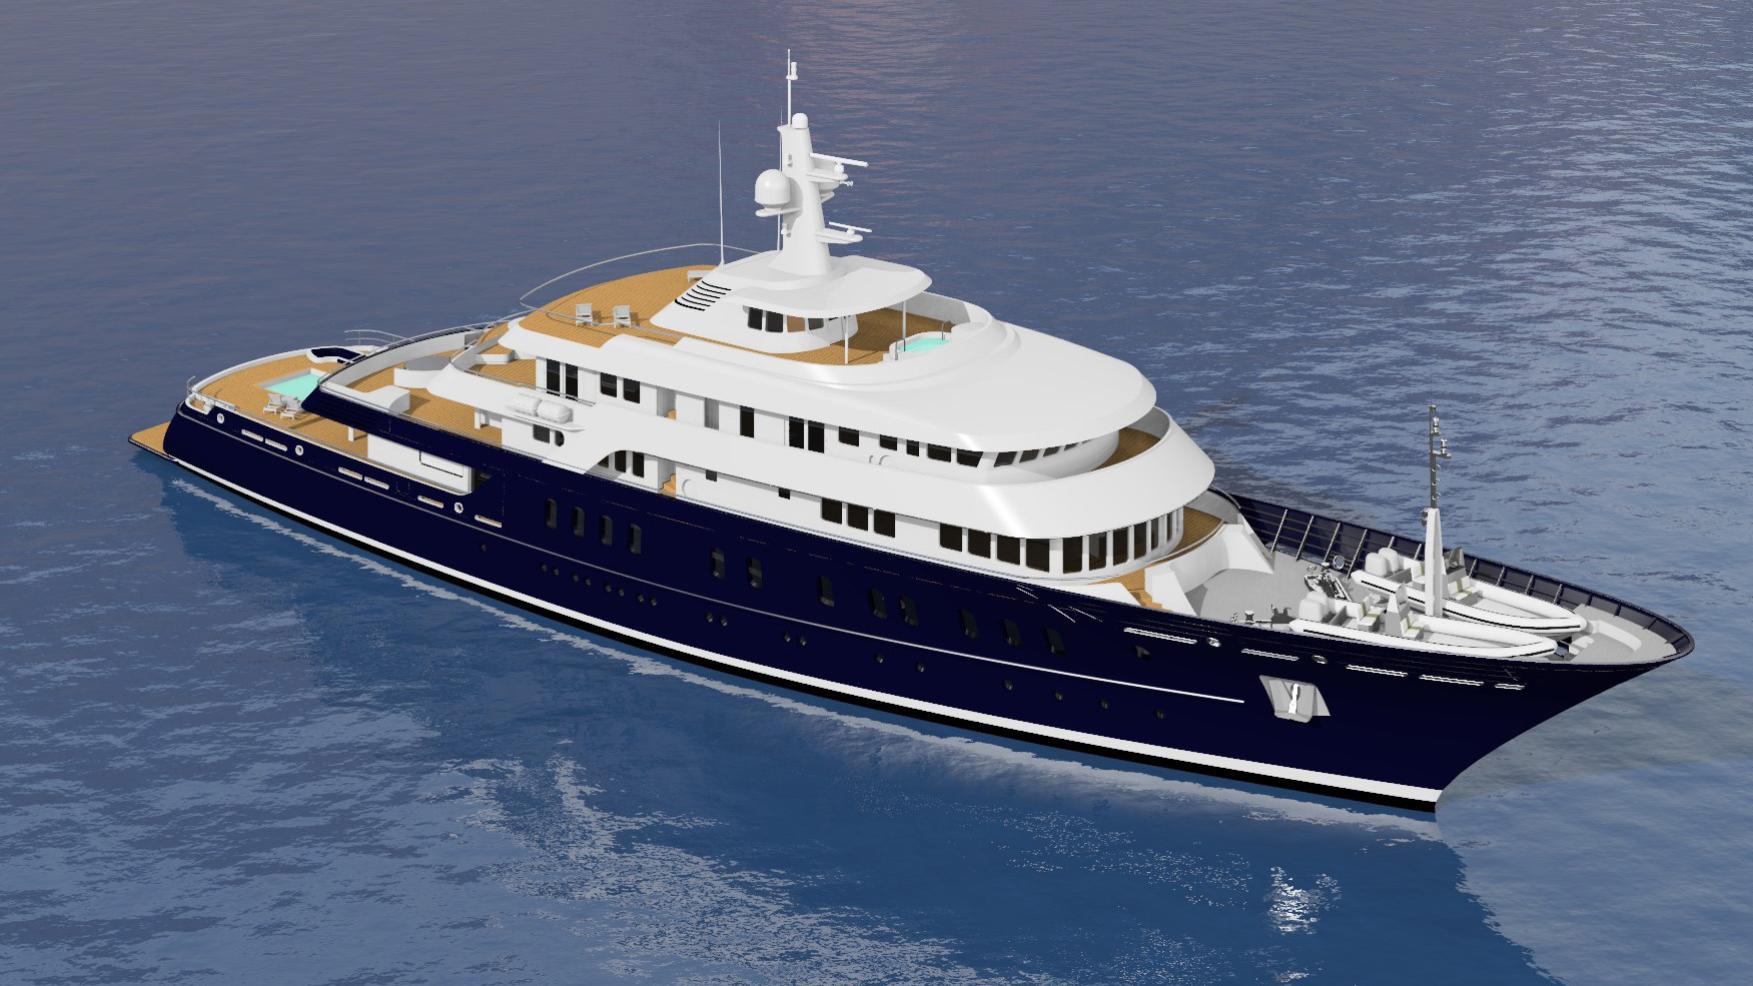 grand seraglio motoryacht akship 82m 2019 rendering half profile